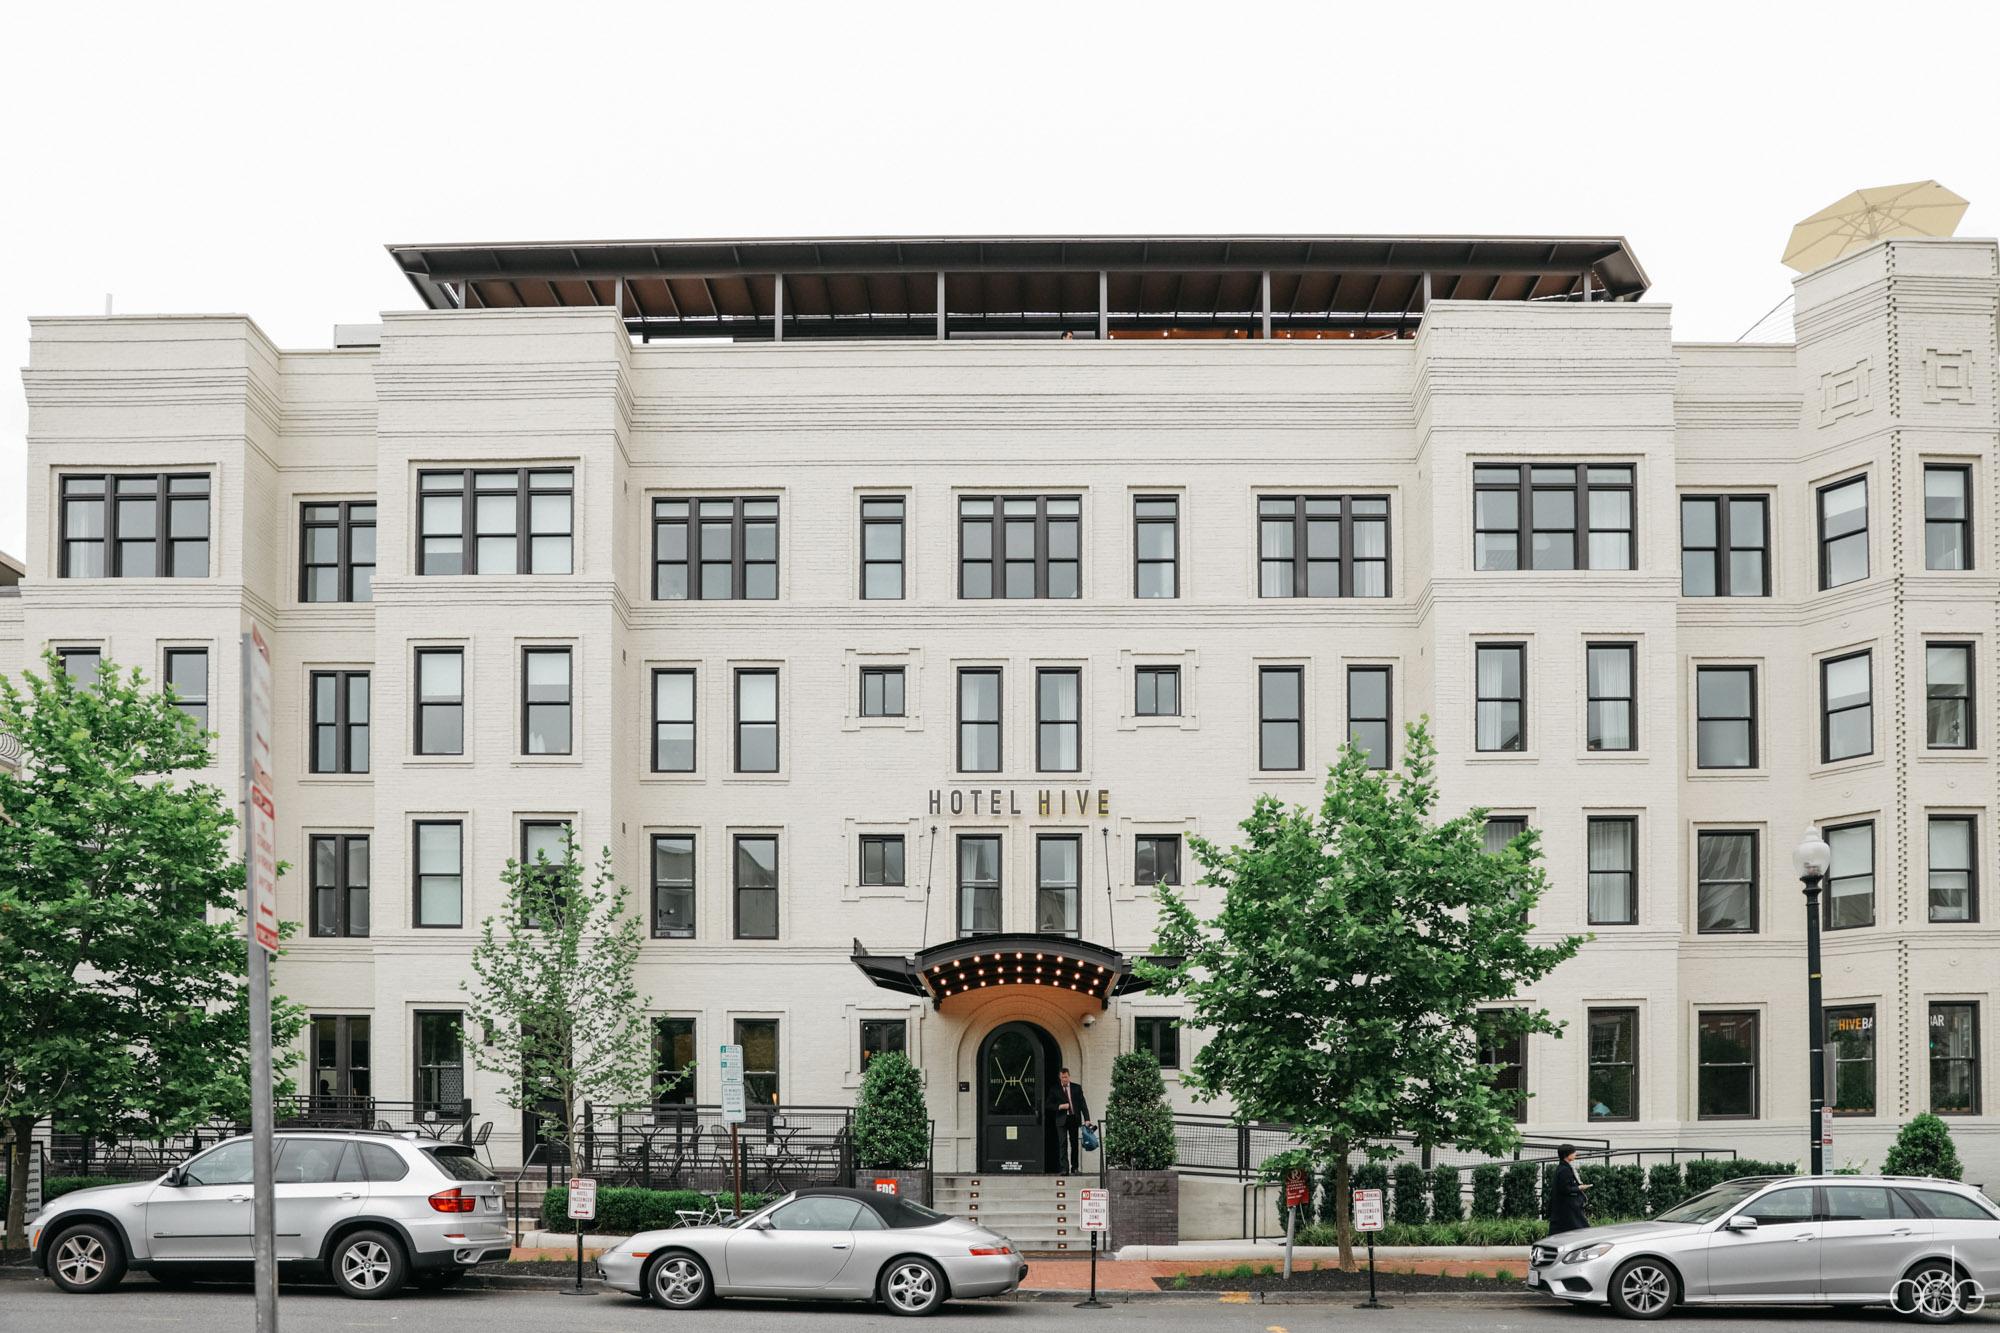 Hotel Hive<strong>Washington, DC</strong>